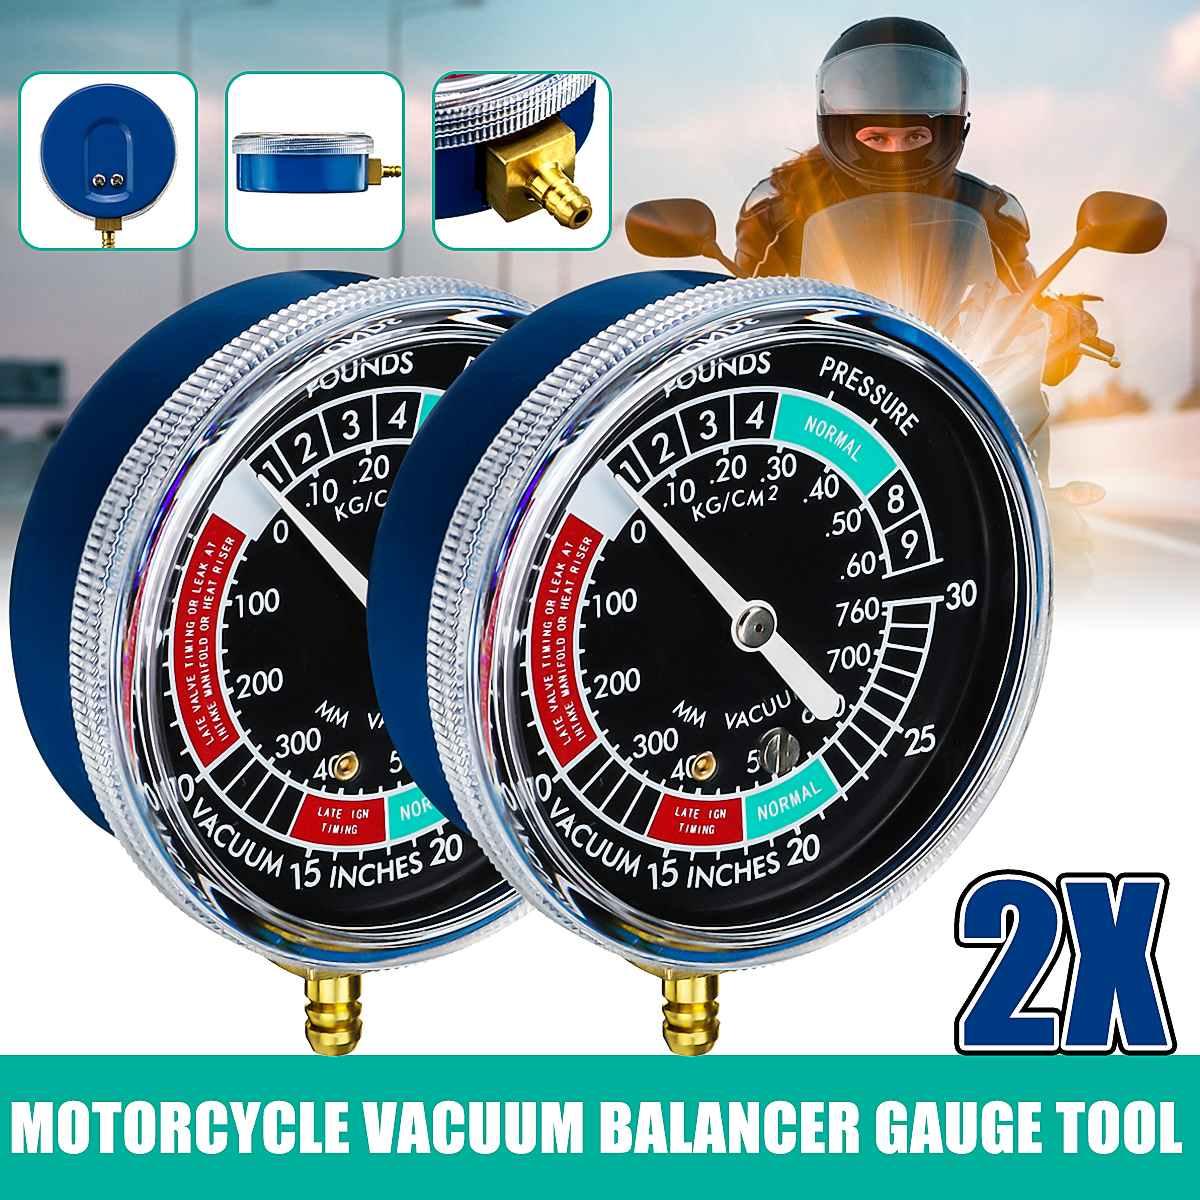 Uniwersalny motocykl gaźnik Carb Vacuum Gauge Balancer synchronizator dla Yamaha/Honda/Suzuki